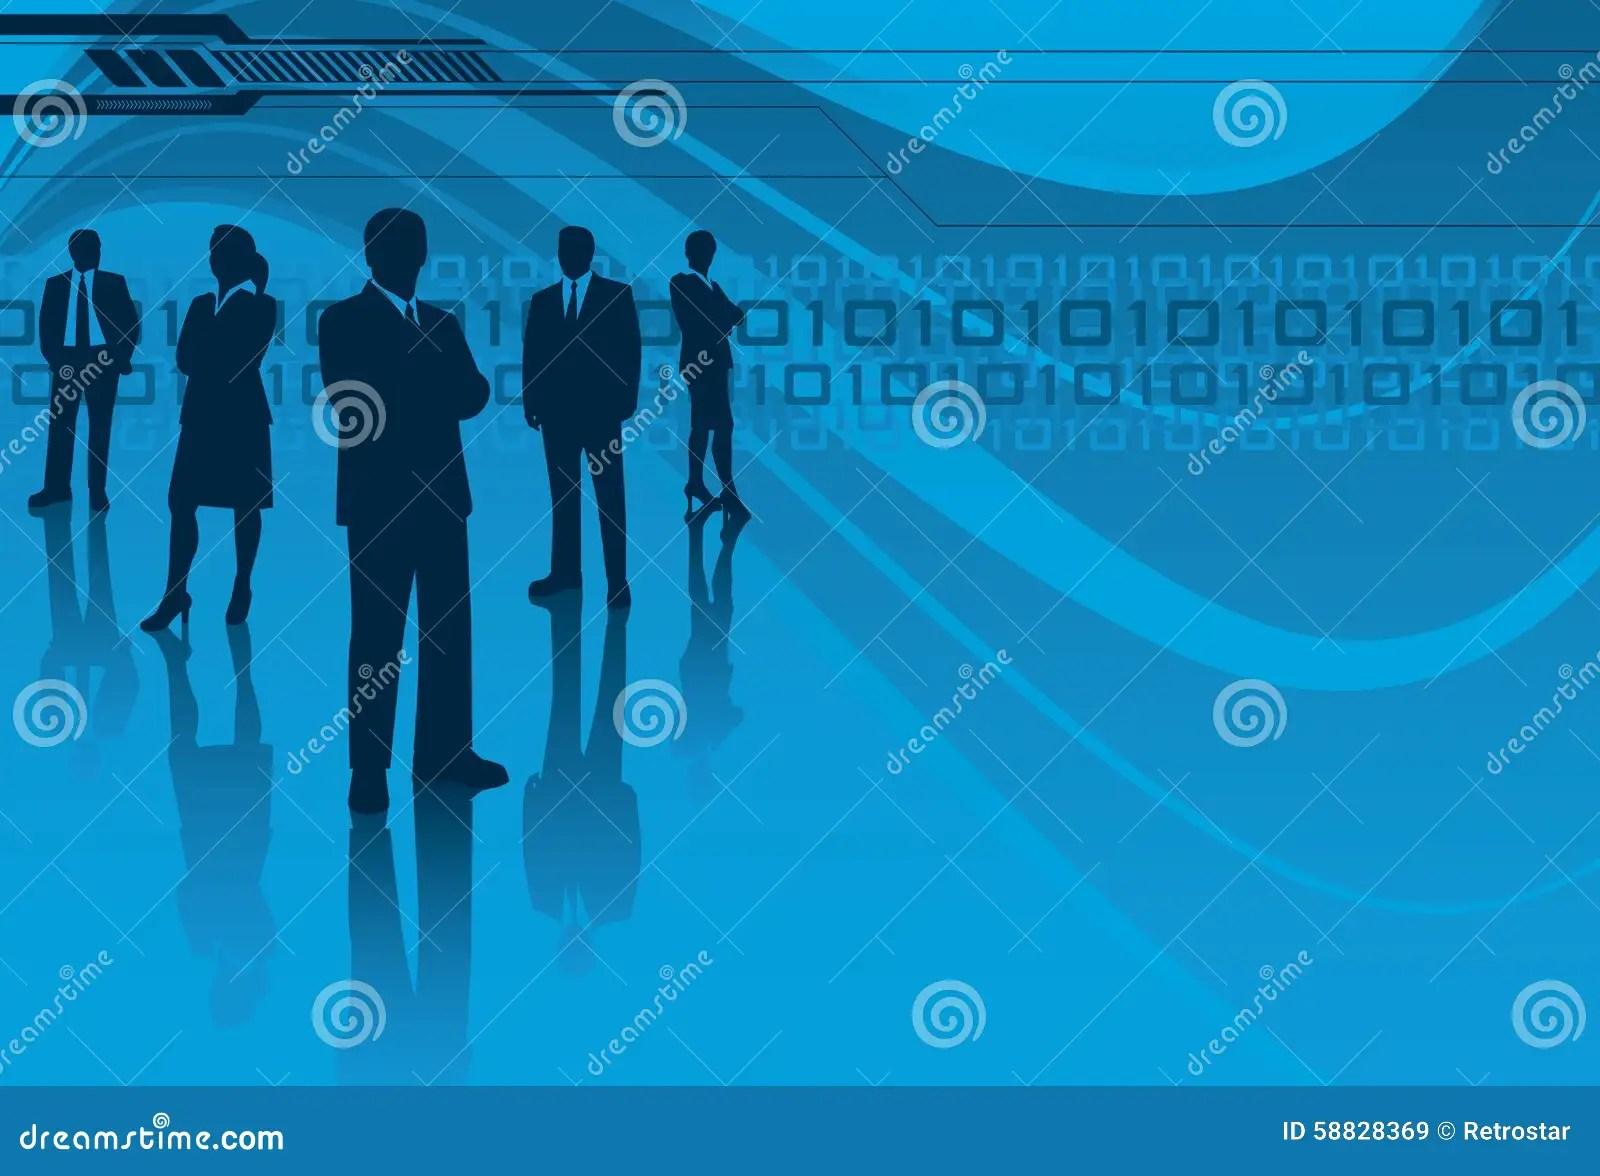 Information Technology Team Stock Vector  Illustration of copy vector 58828369